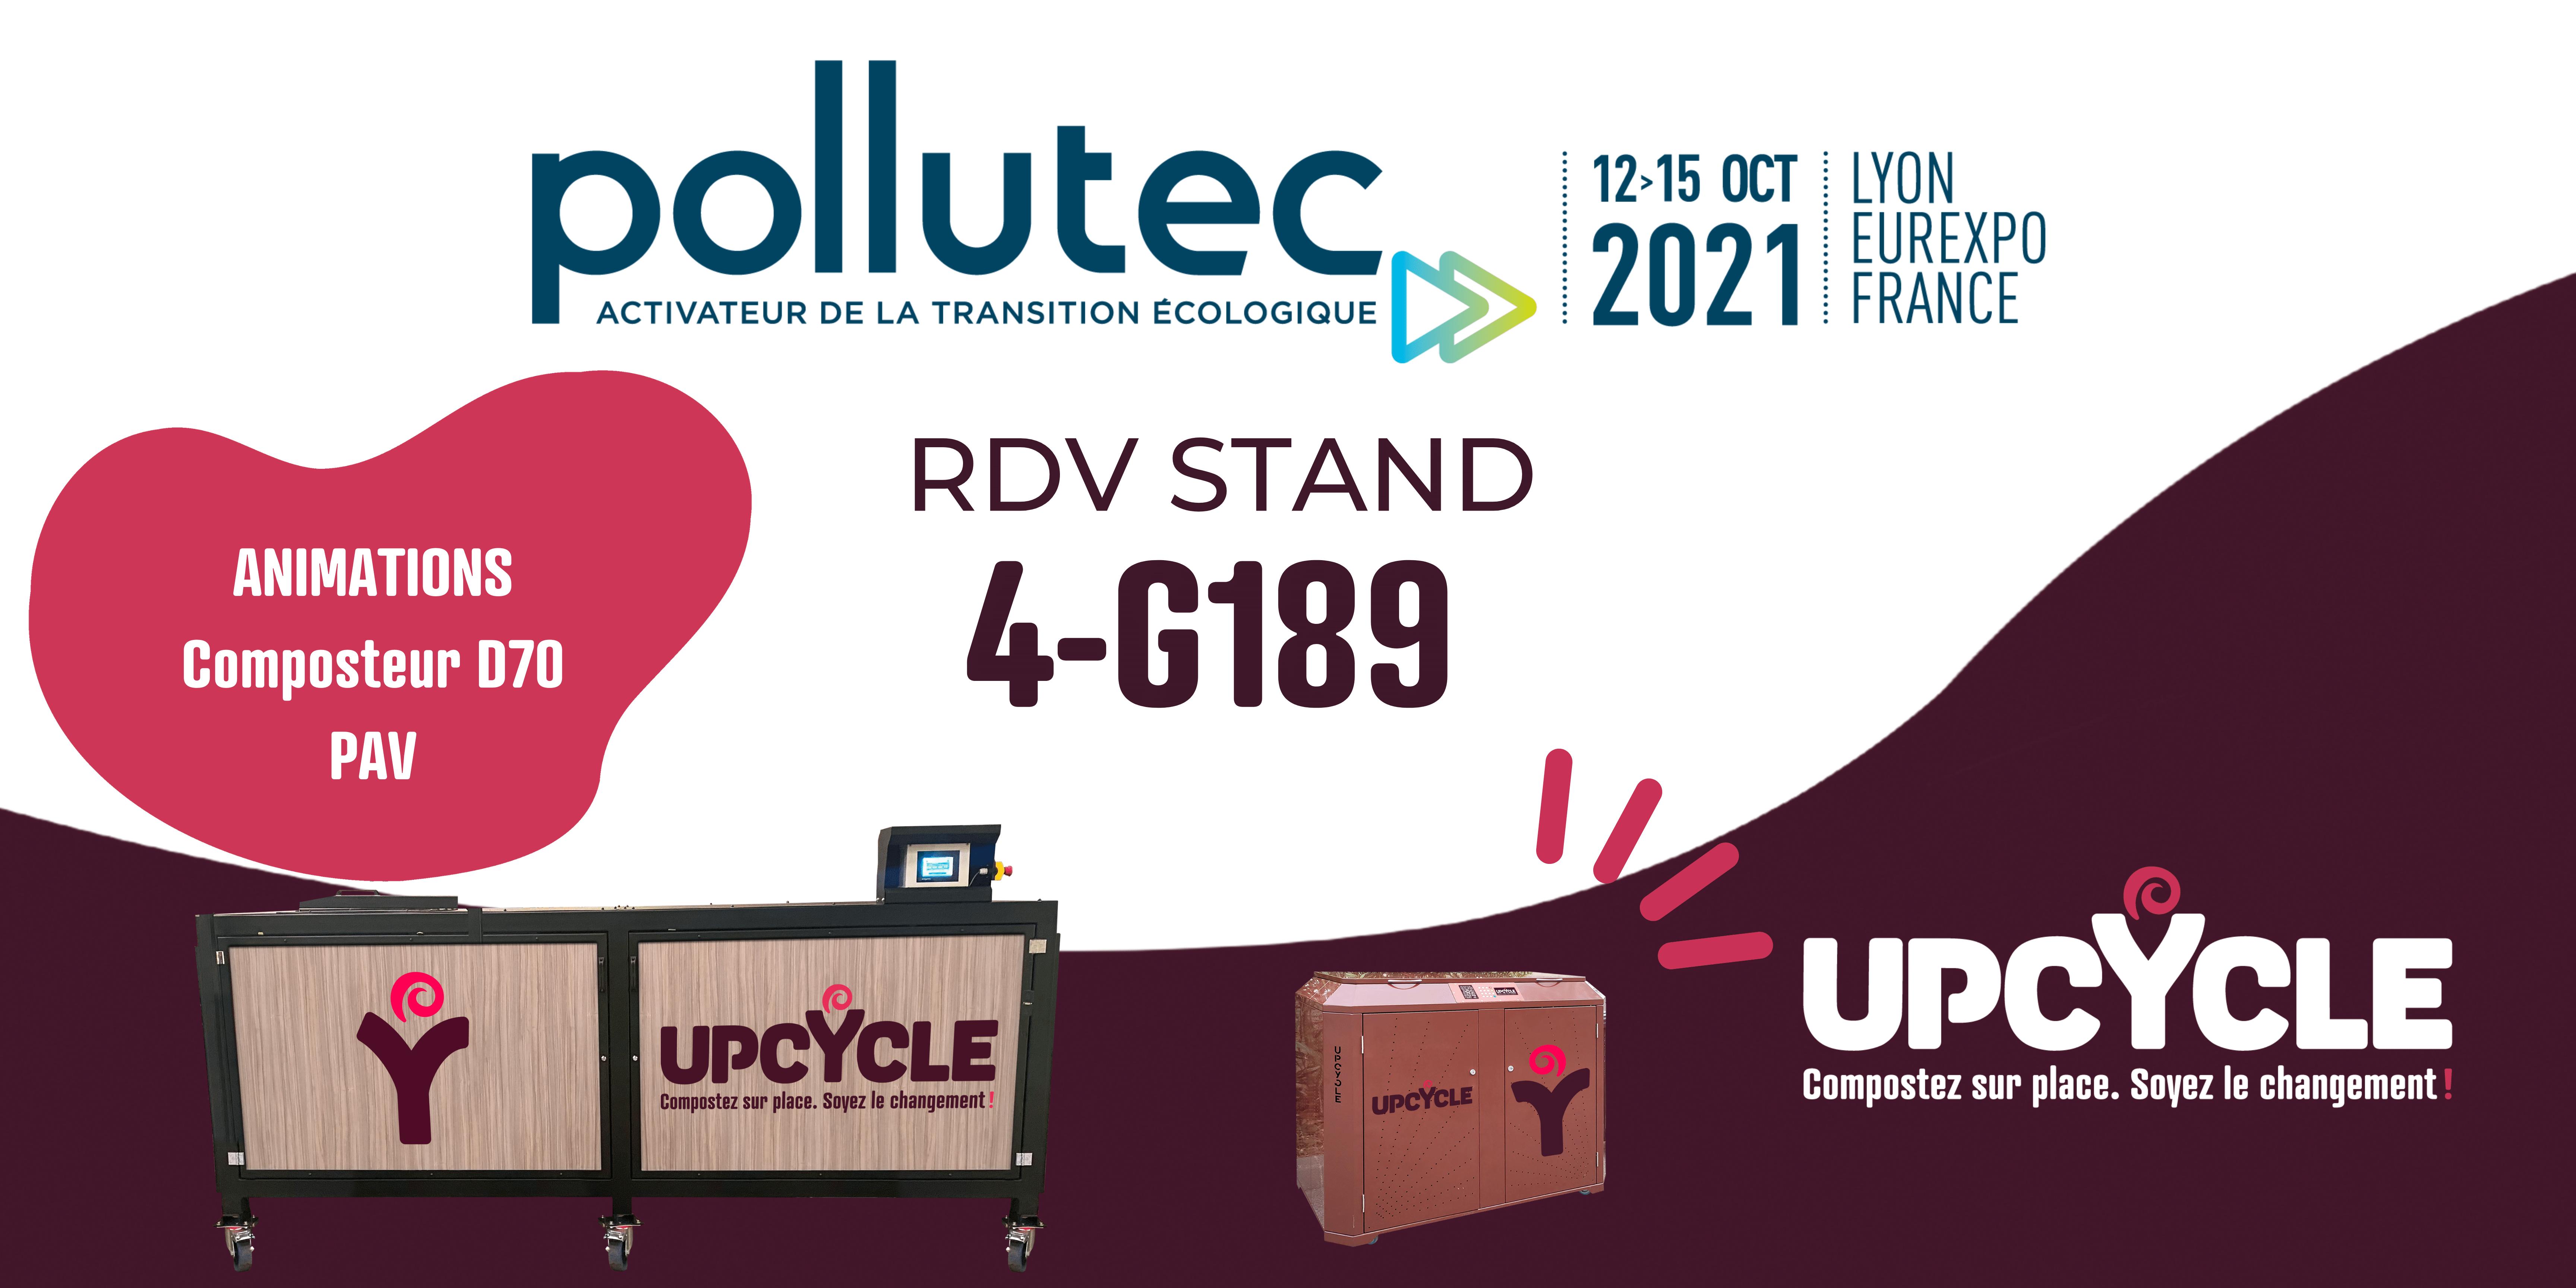 Pollutec 2021 | Upcycle animations composteur et point d'apport volontaire